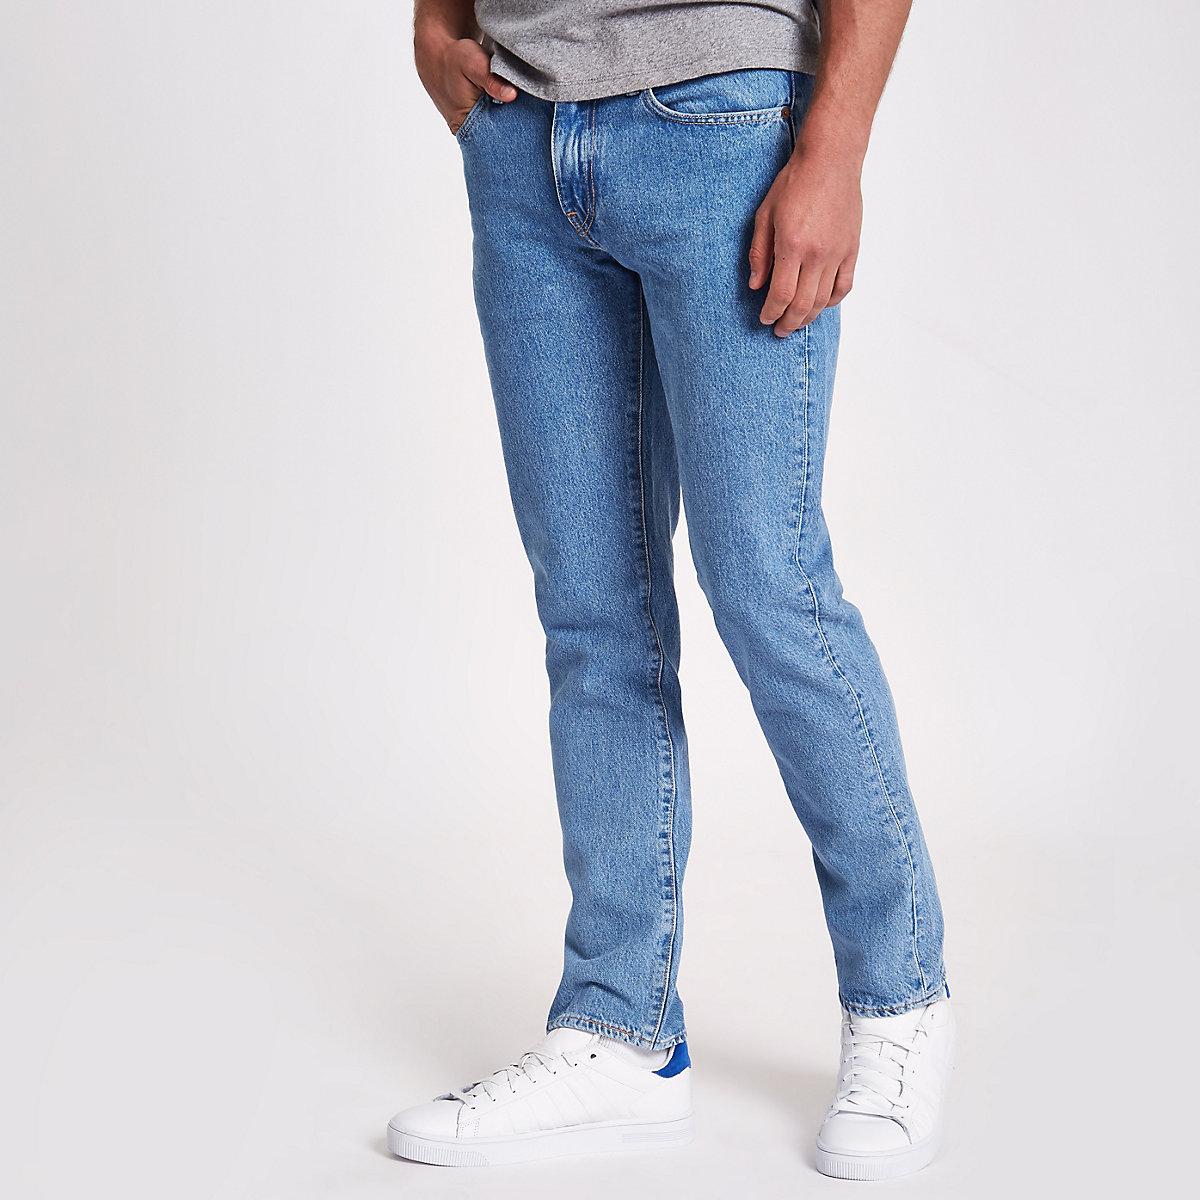 Levi s – Hellblaue Slim Fit Jeans 511 - Slim Fit Jeans - Jeans - Herren 807f3fa39d